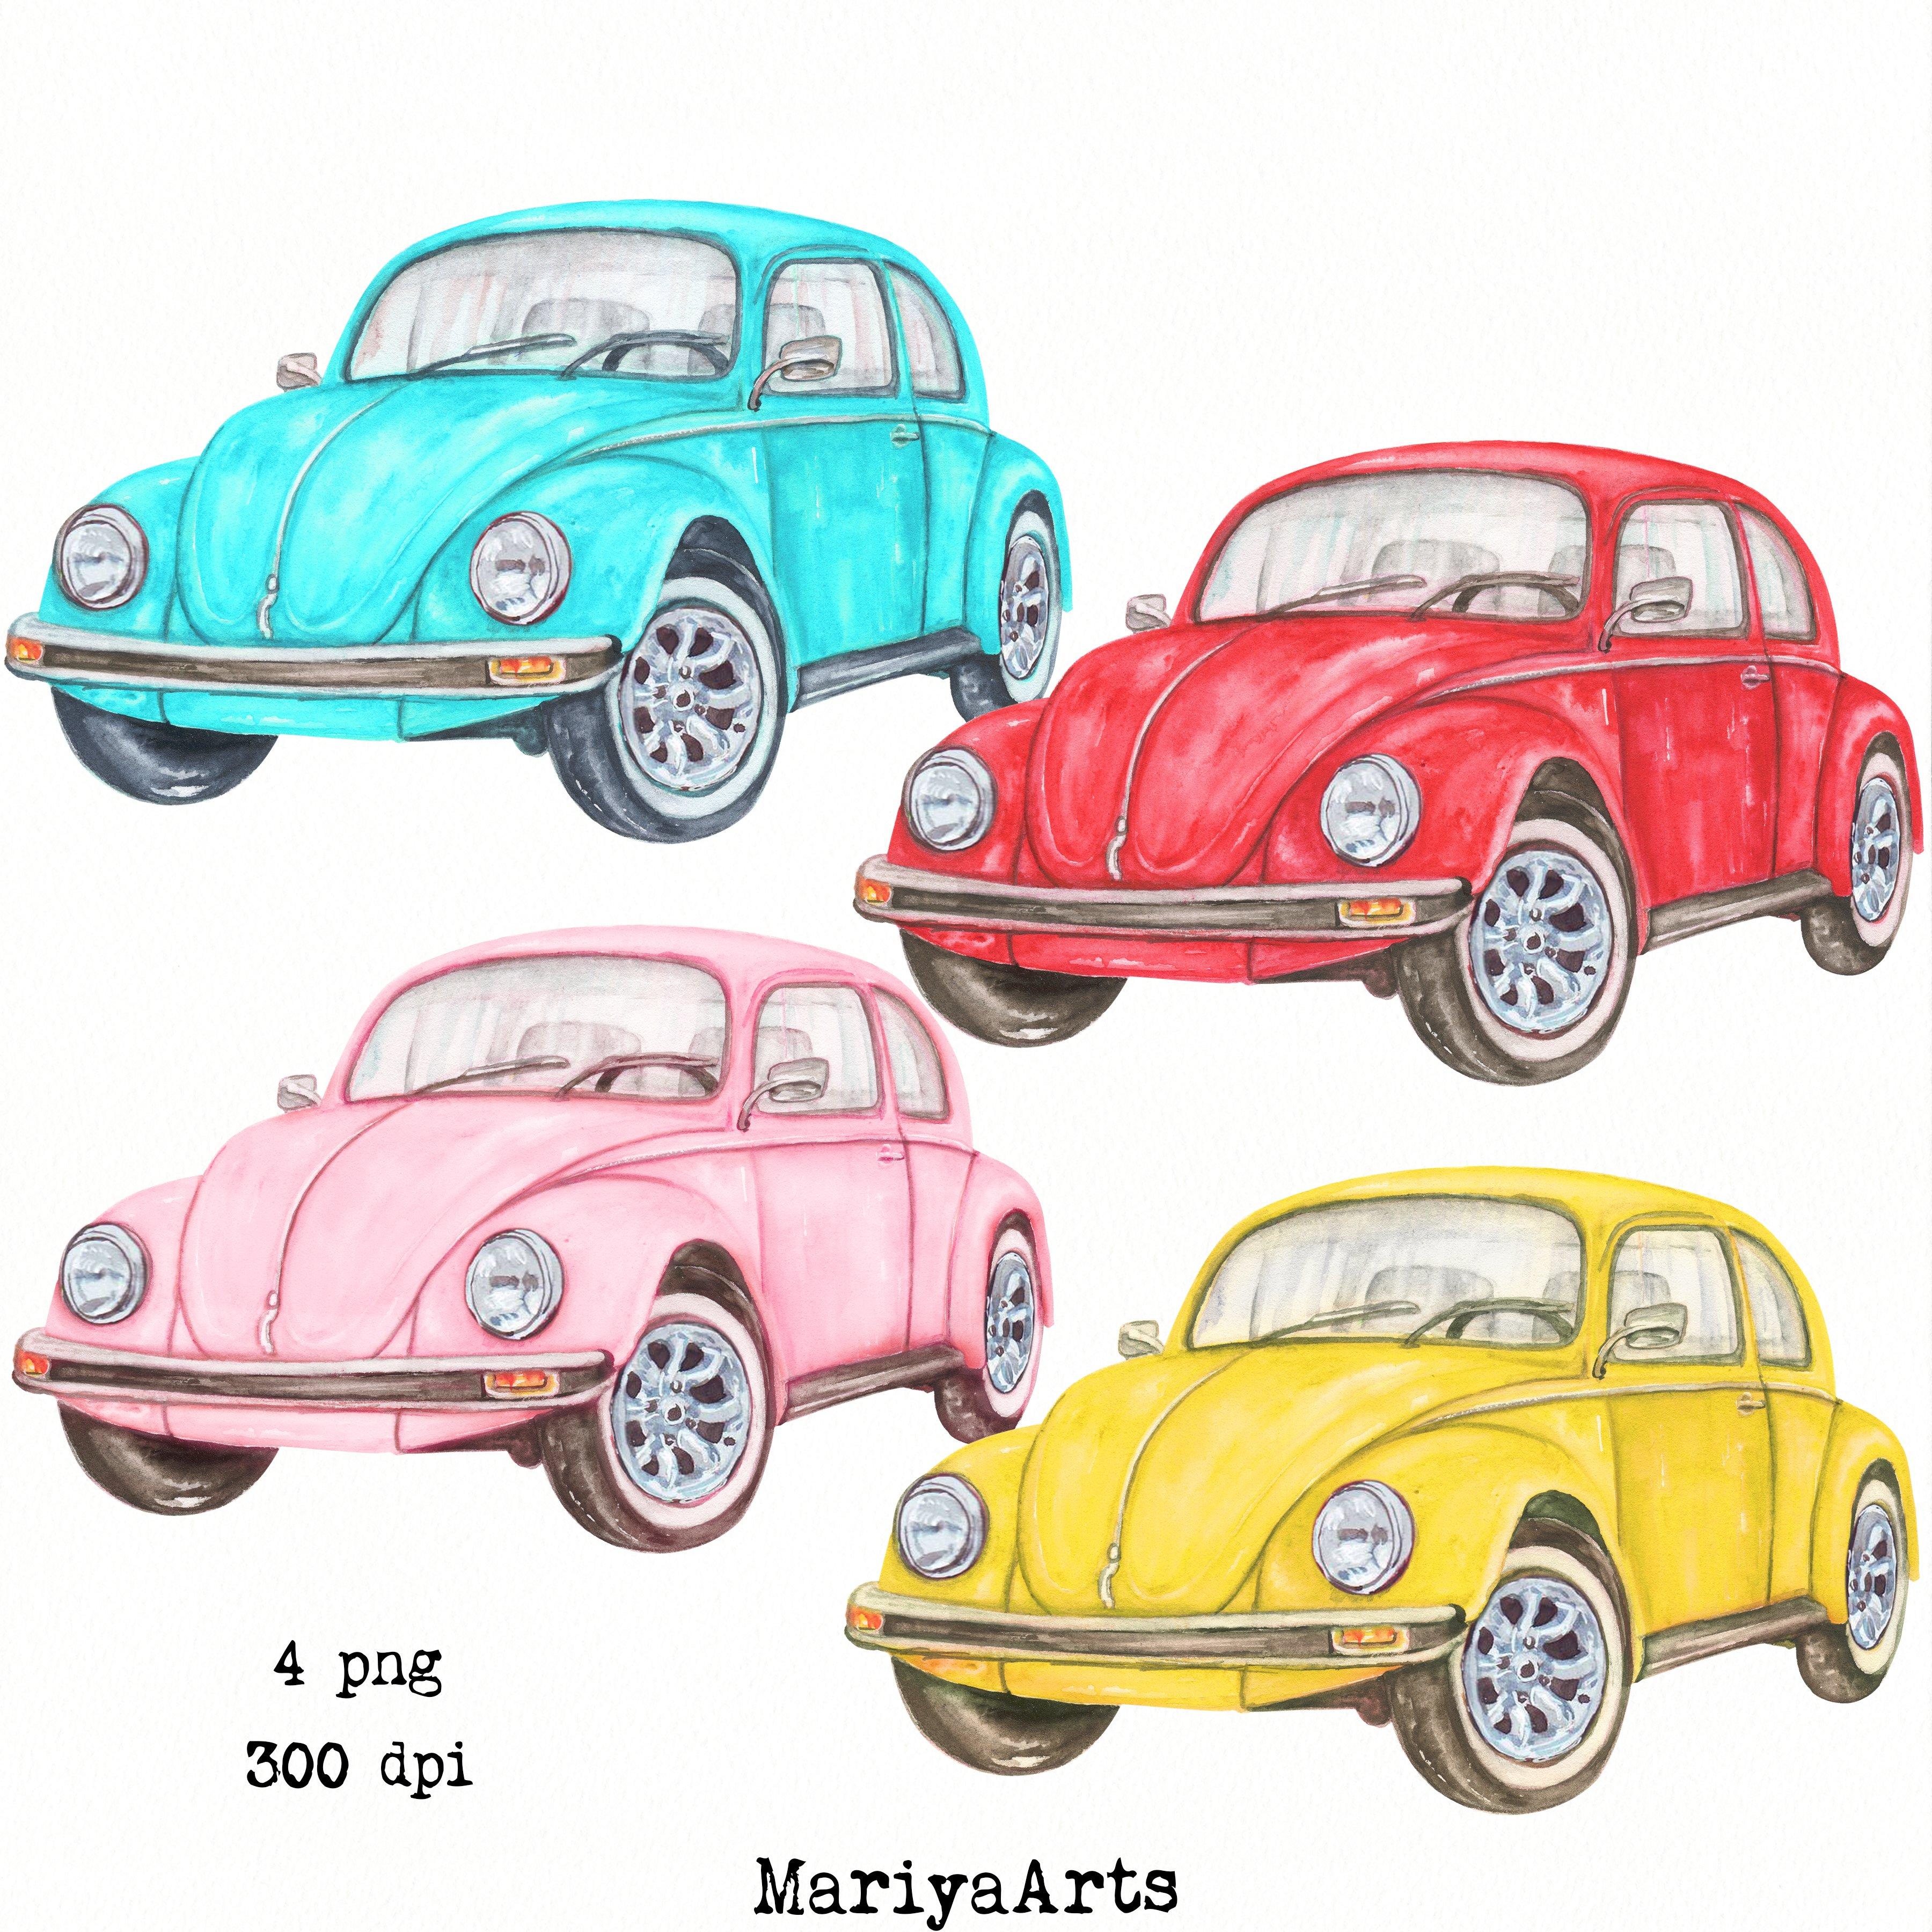 Download Red Yellow Pink Blue Car Vintage Vw Beetle Watercolor 751120 Illustrations Design Bundles